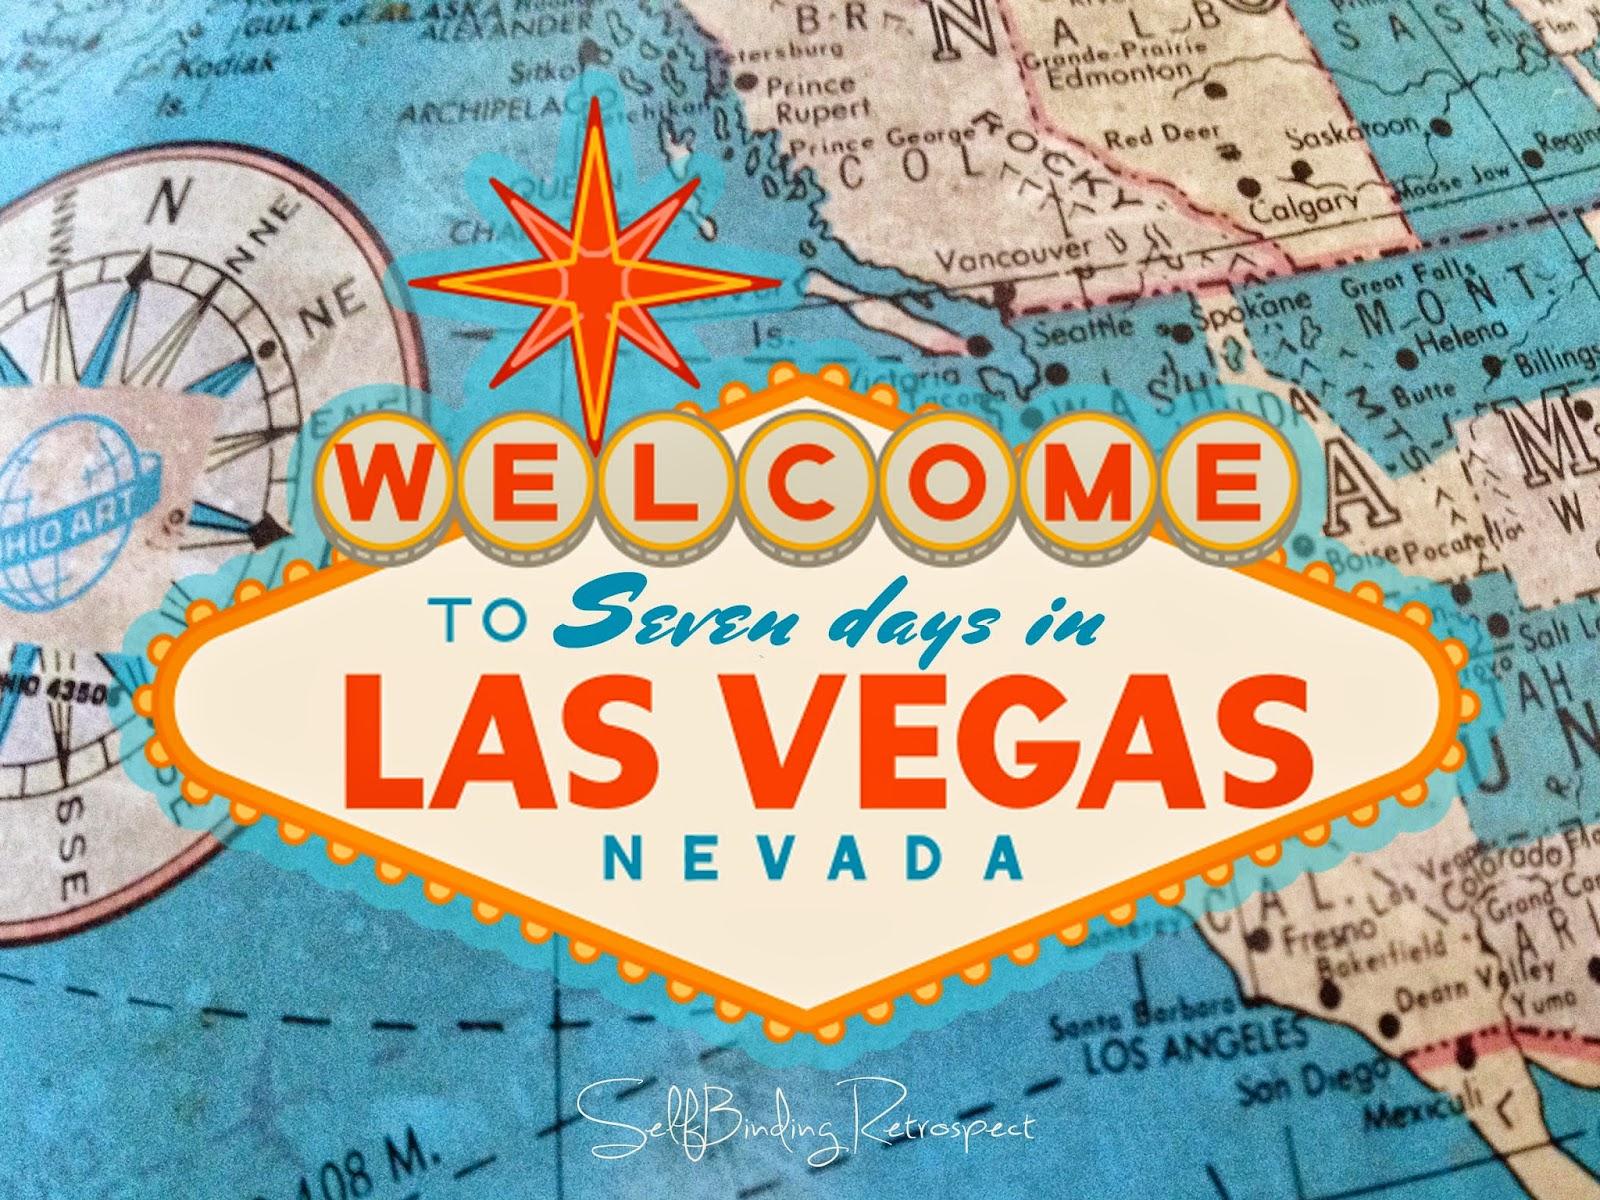 Seven Days In Vegas - SelfBinding Retrospect by Alanna Rusnak